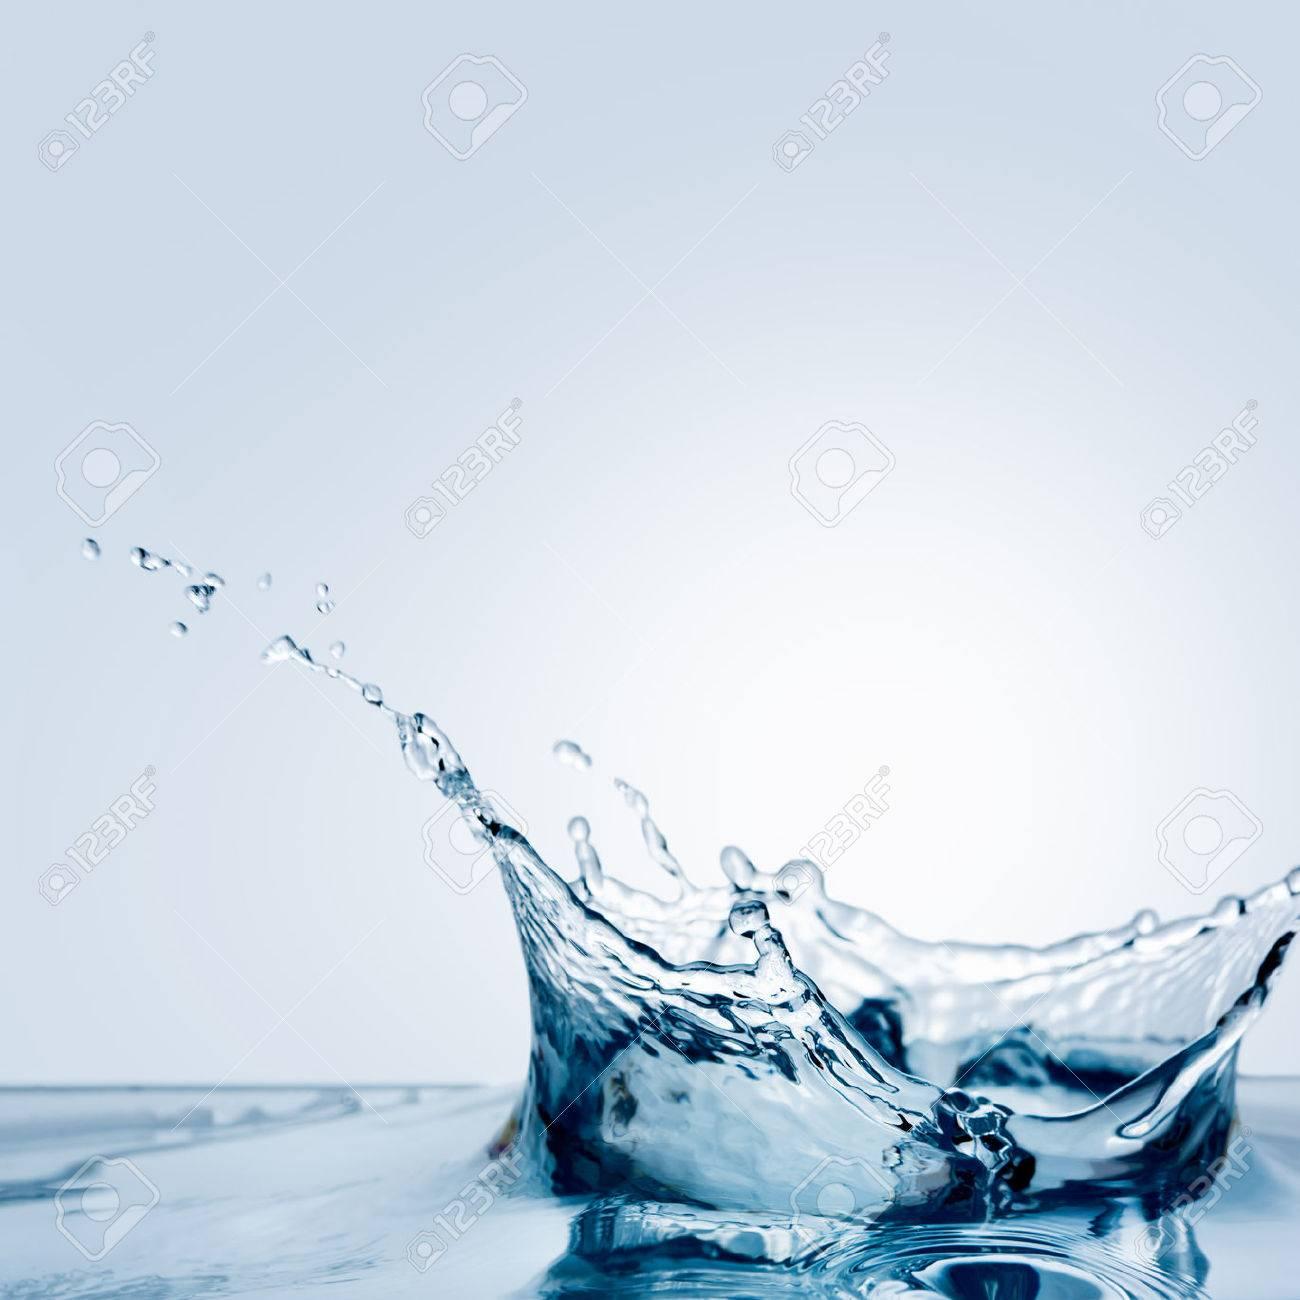 Beautiful splash of water falling from a slice of lemon Stock Photo - 22254706